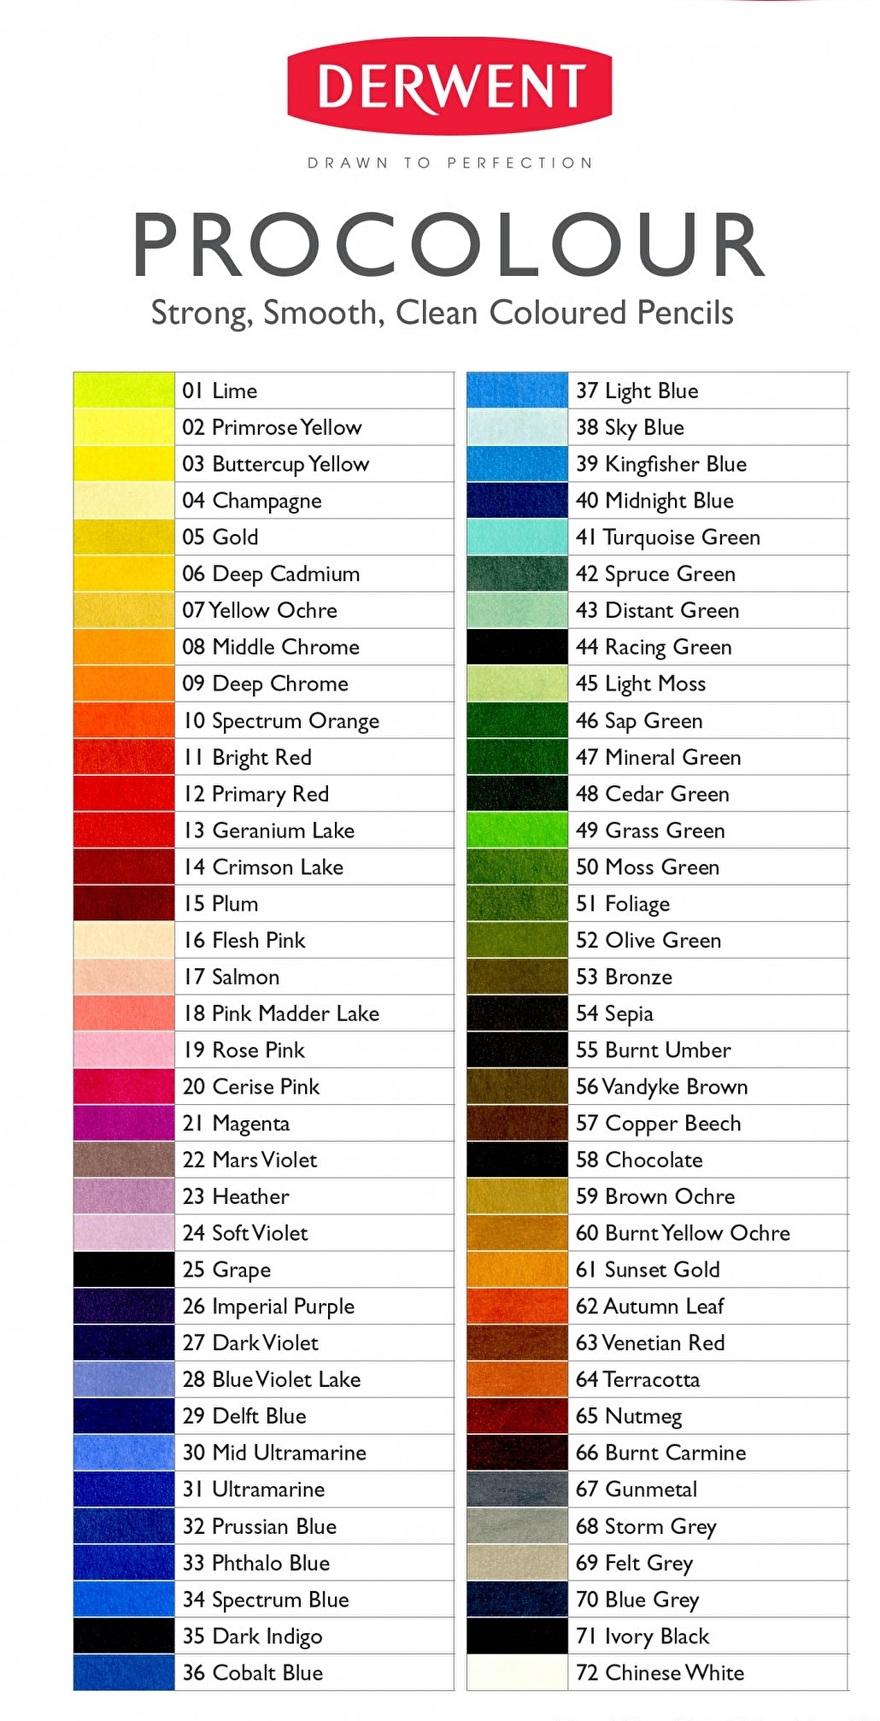 derwent_procolour-kleurenkaart.jpg